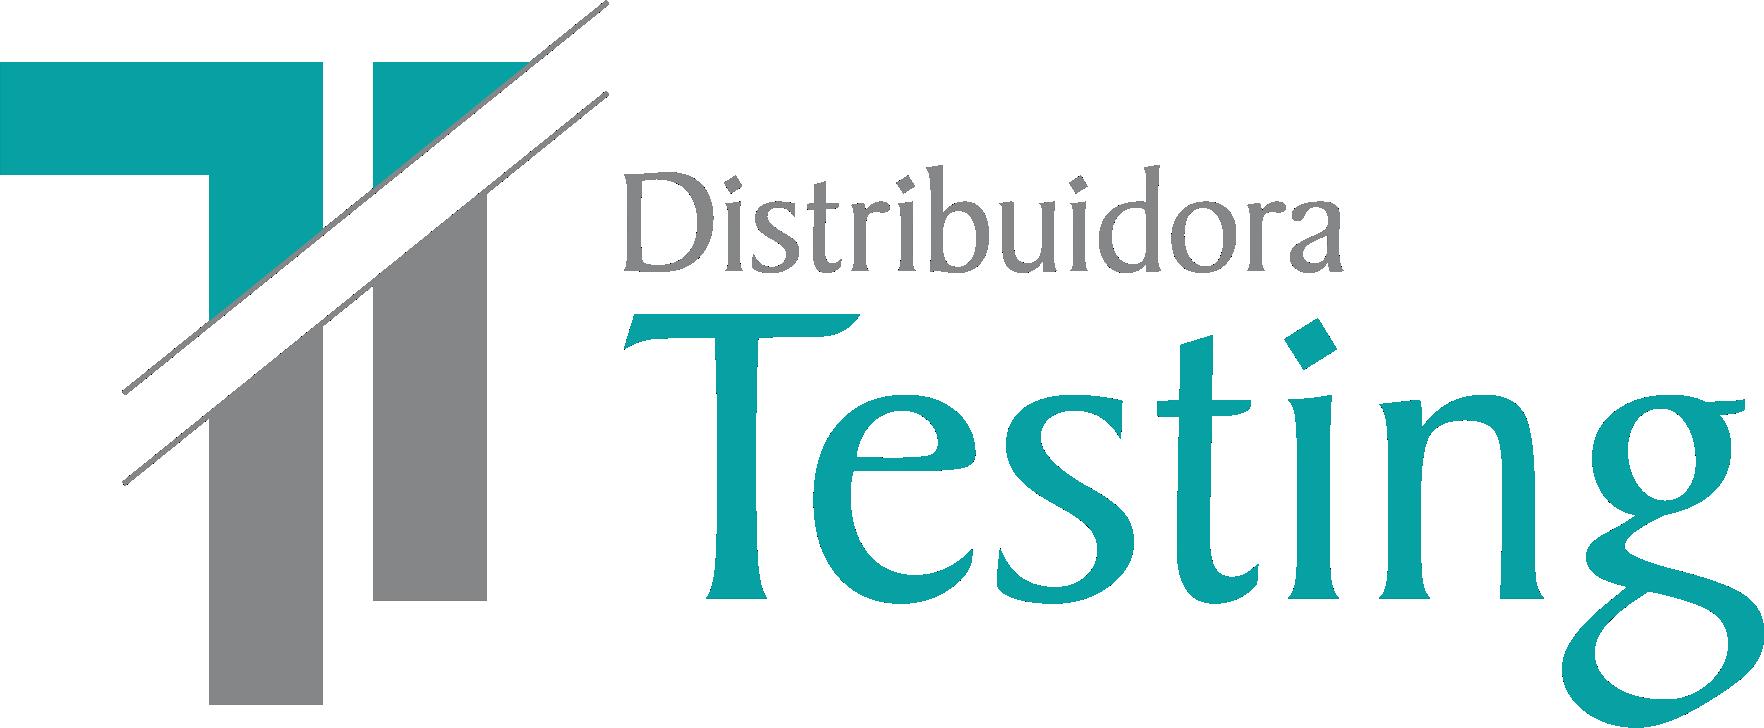 Distribuidora Testing